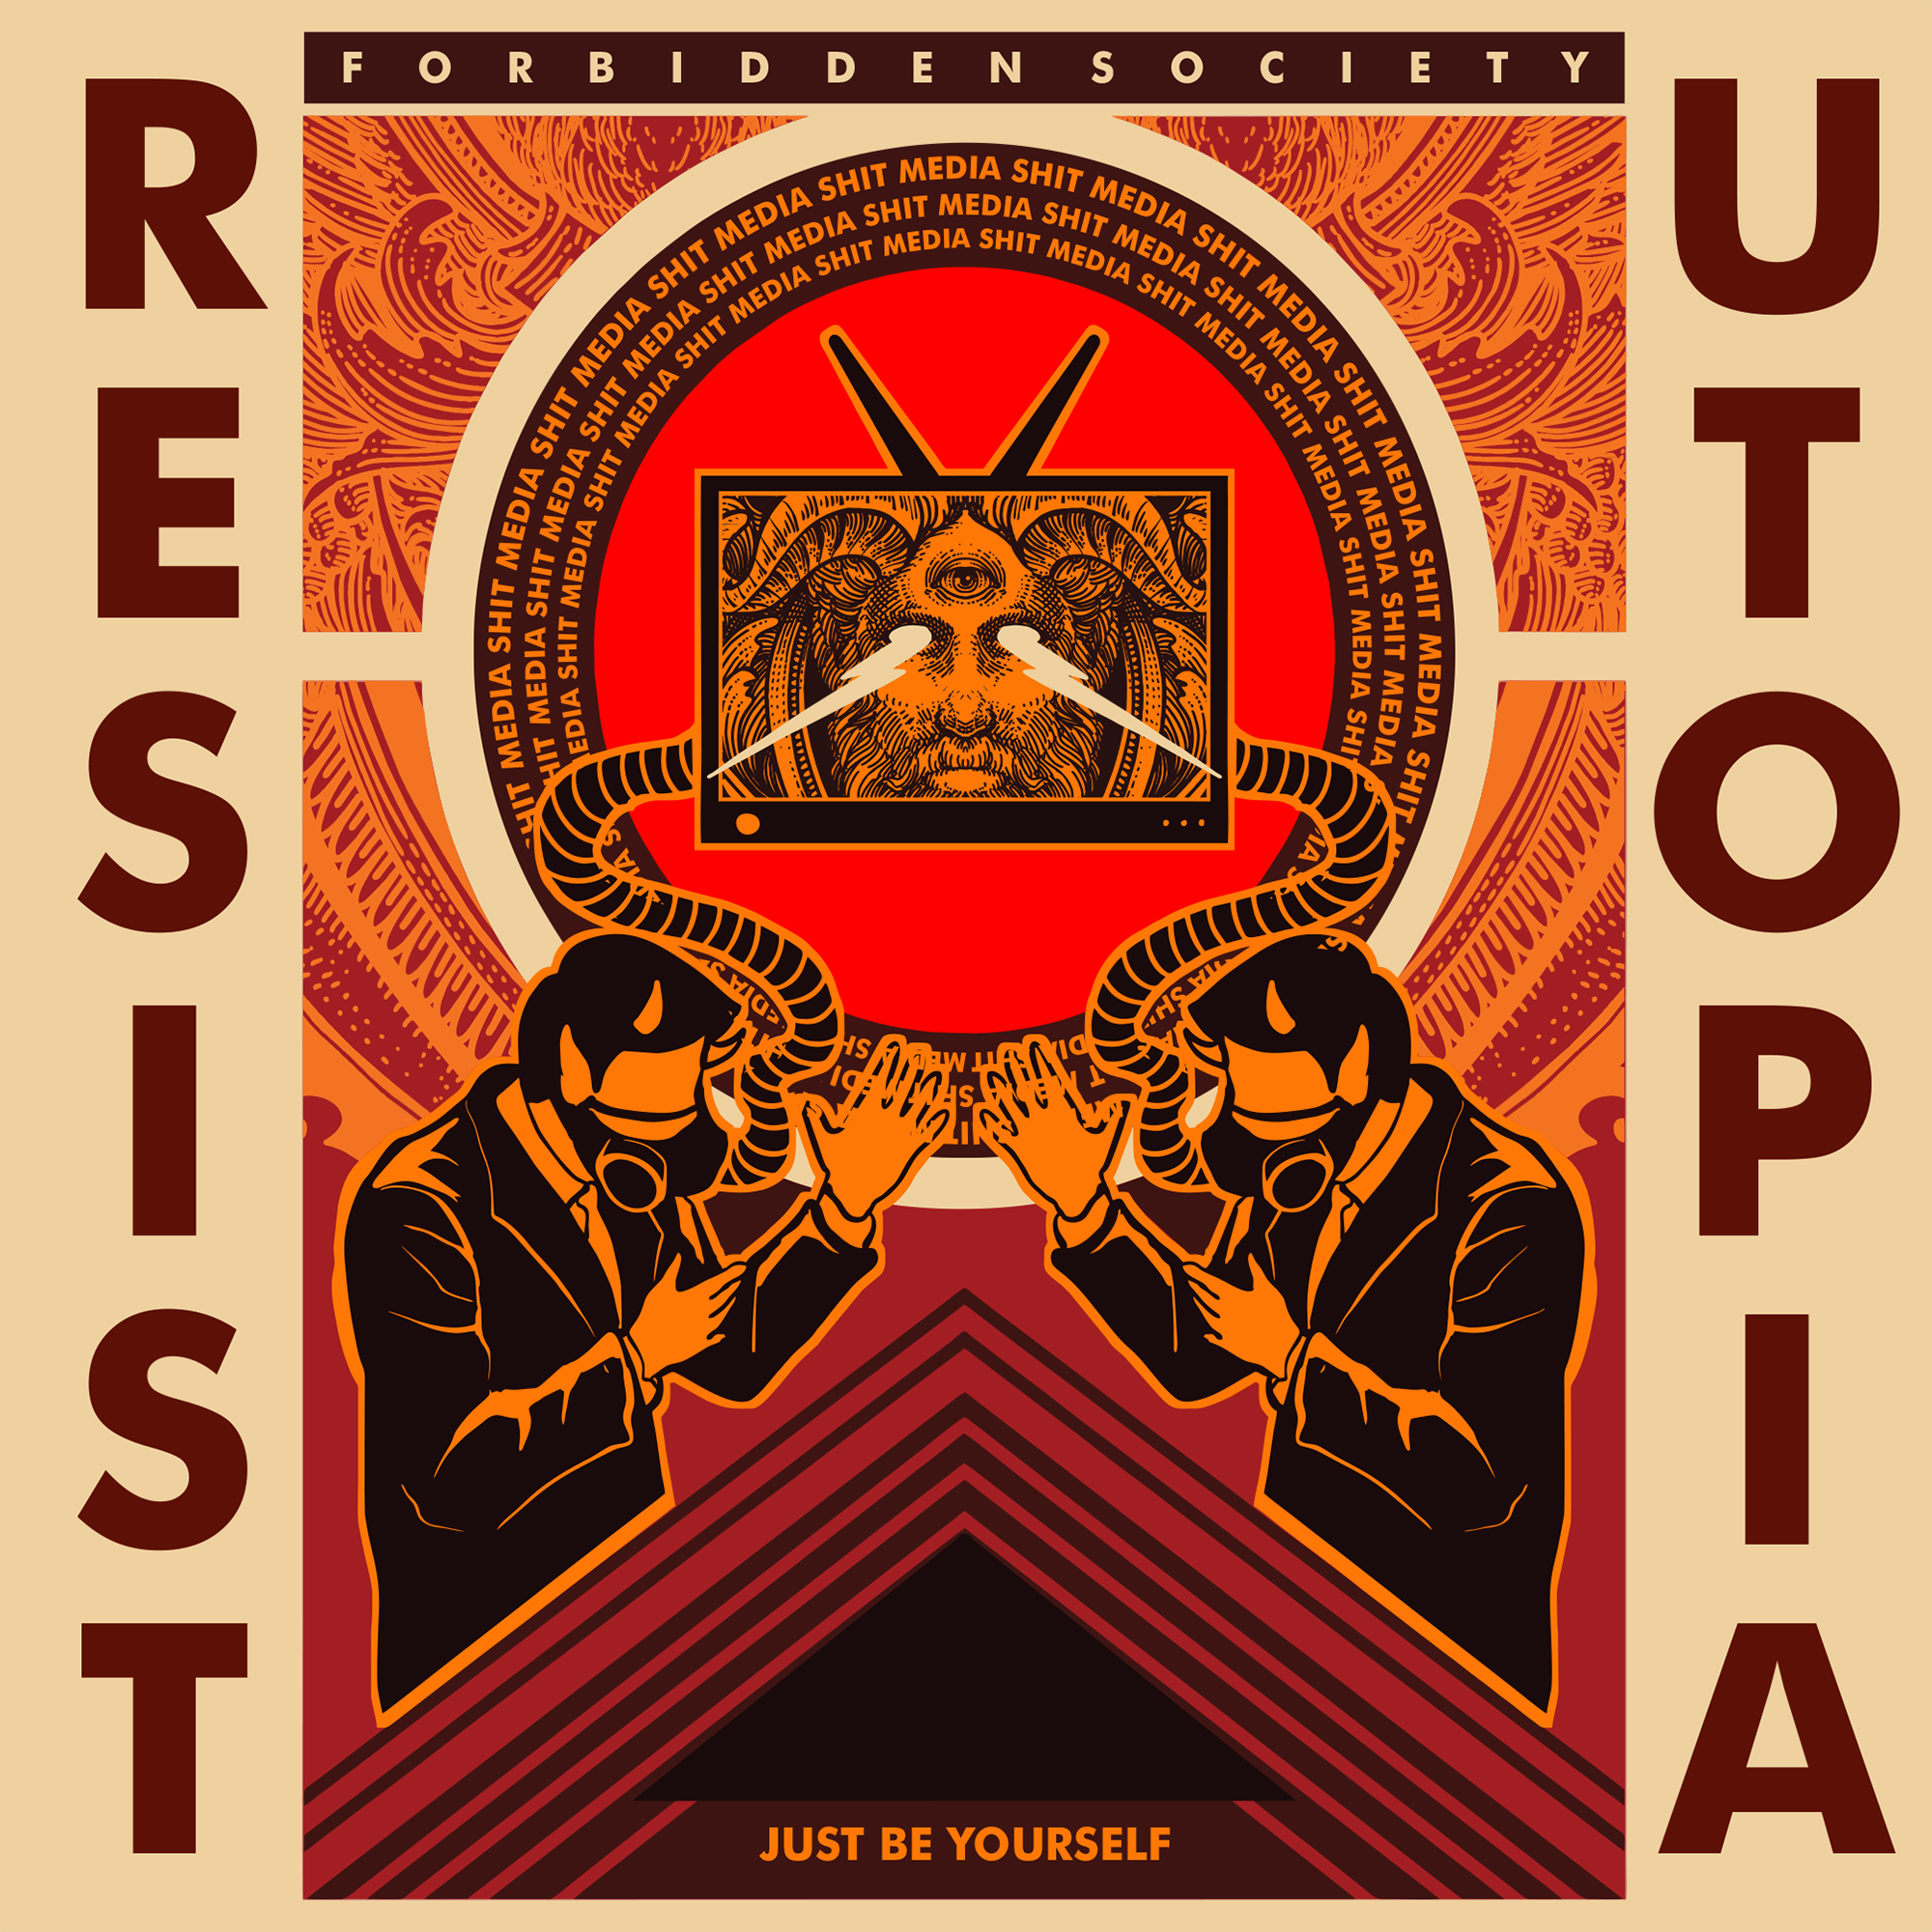 Resist / Utopia Image